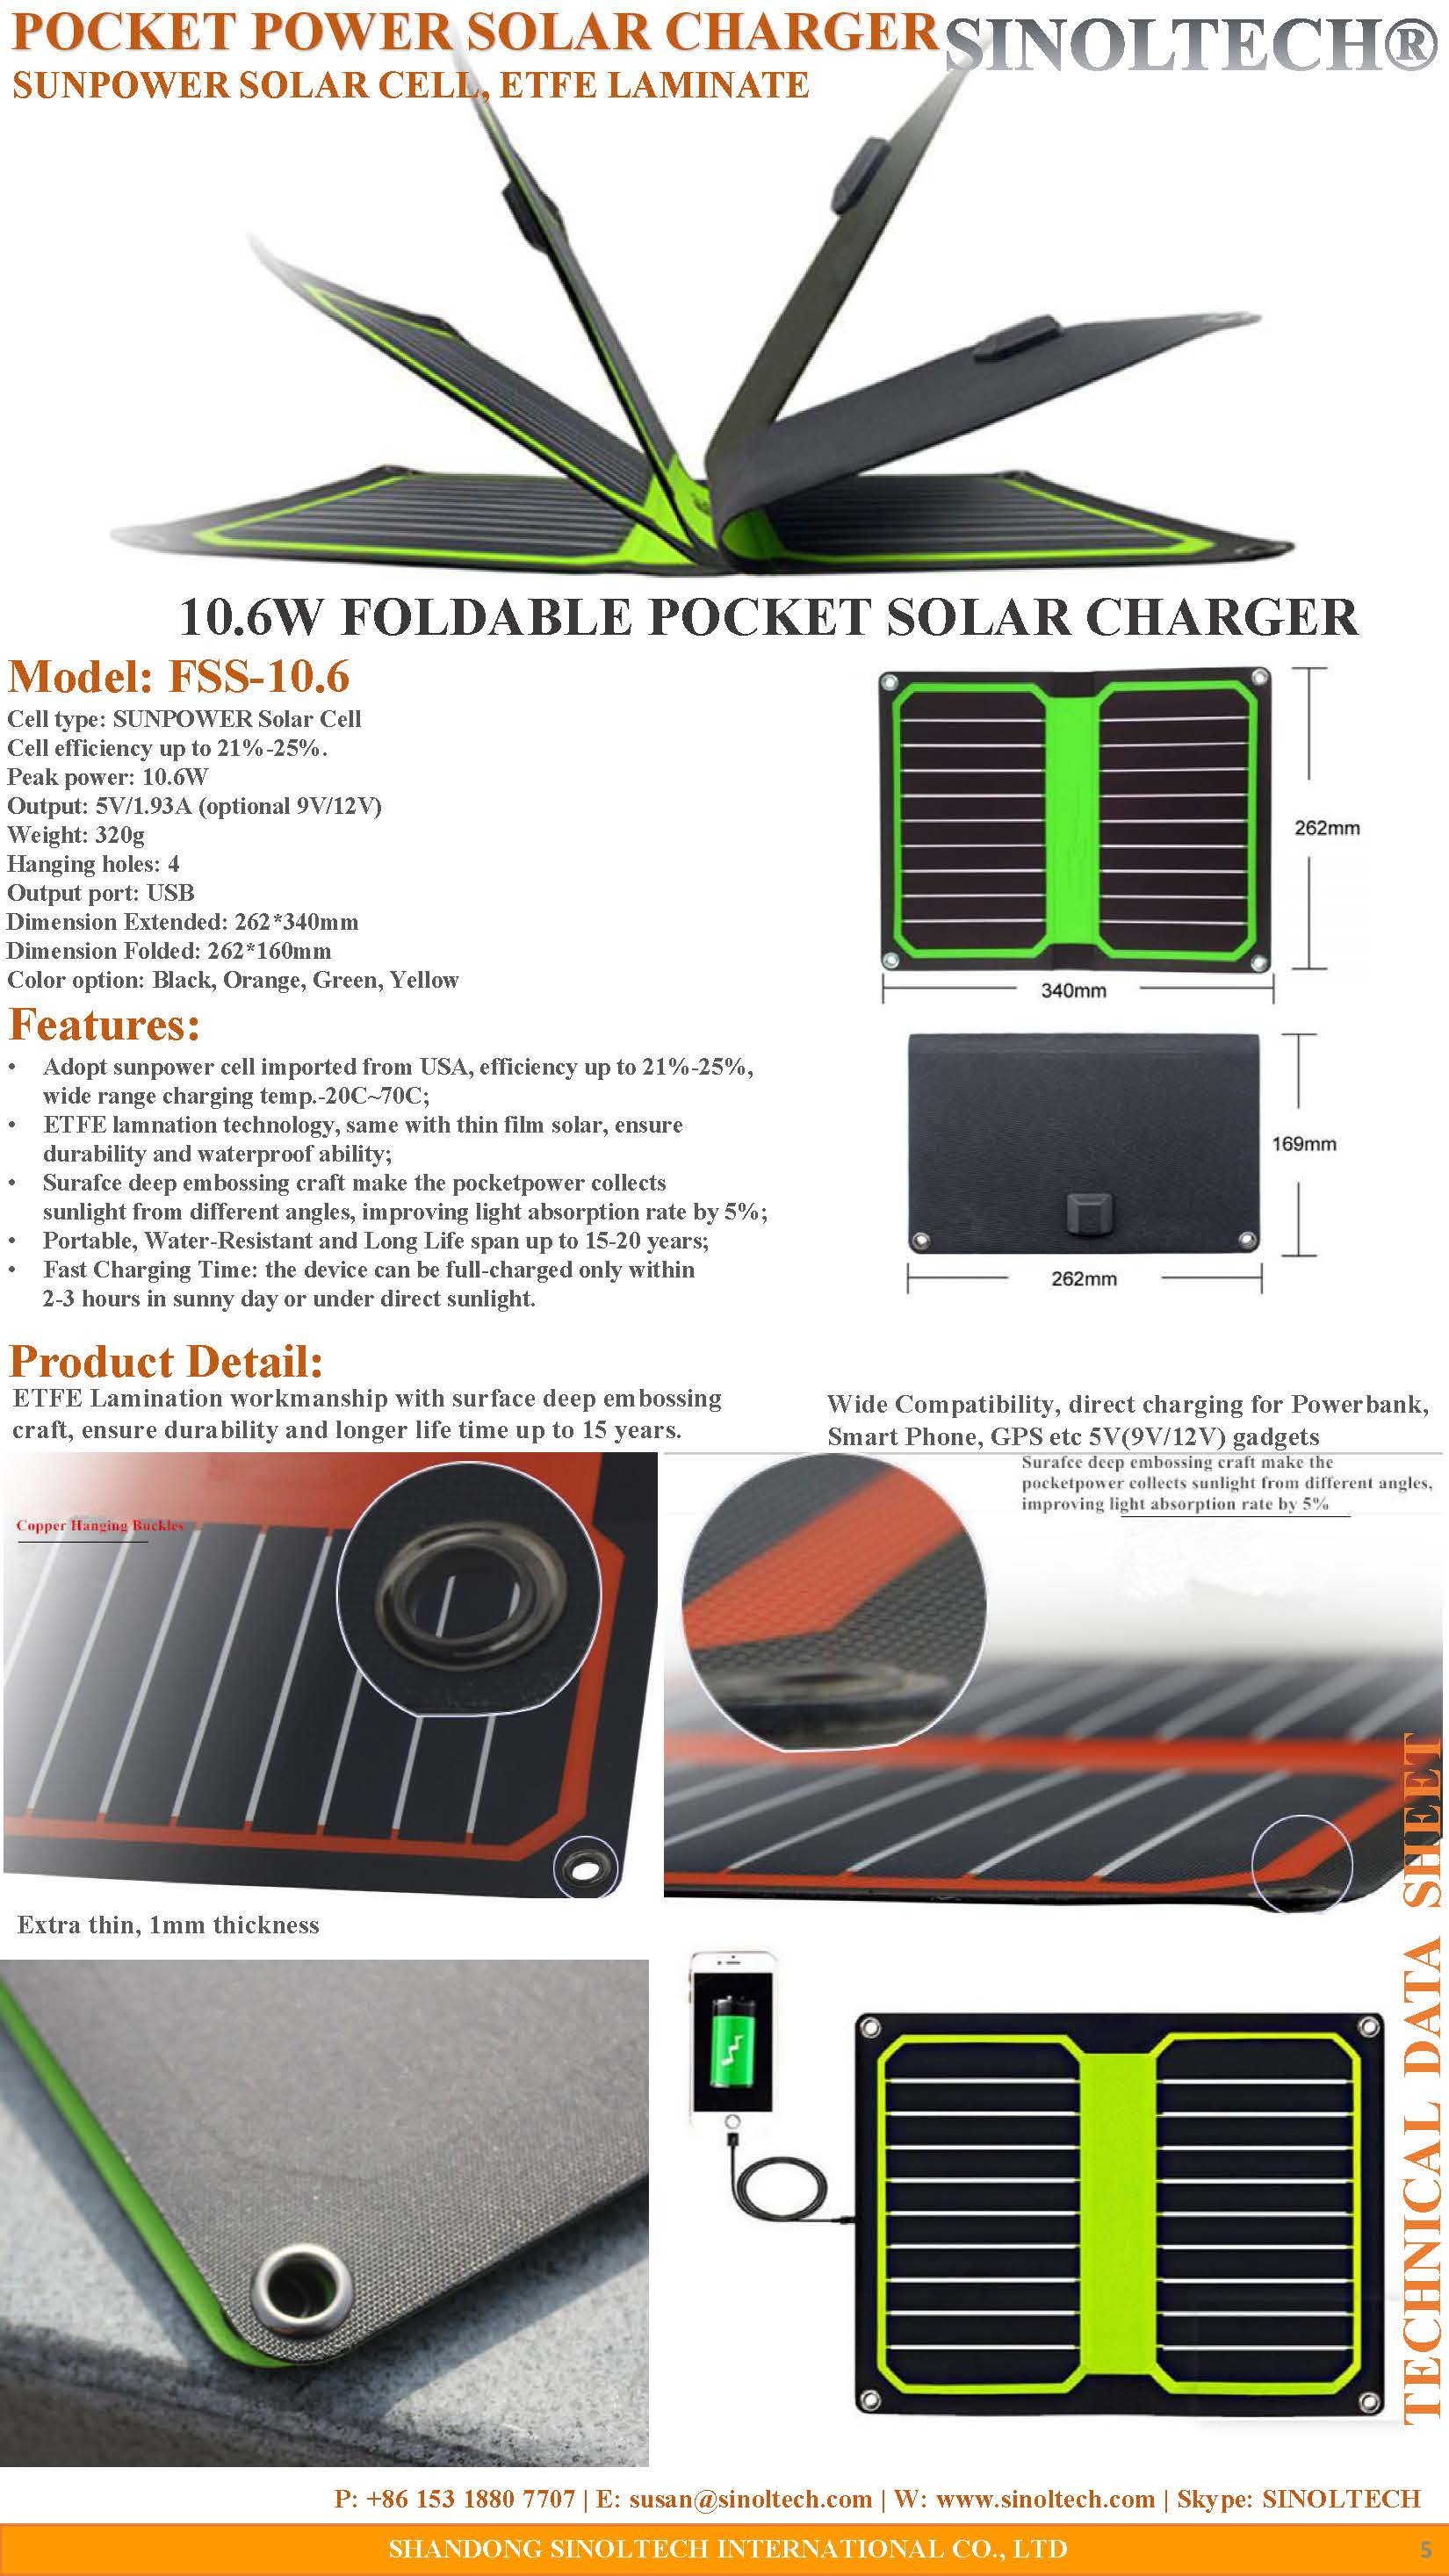 10.6W Sunpower folding solar charger